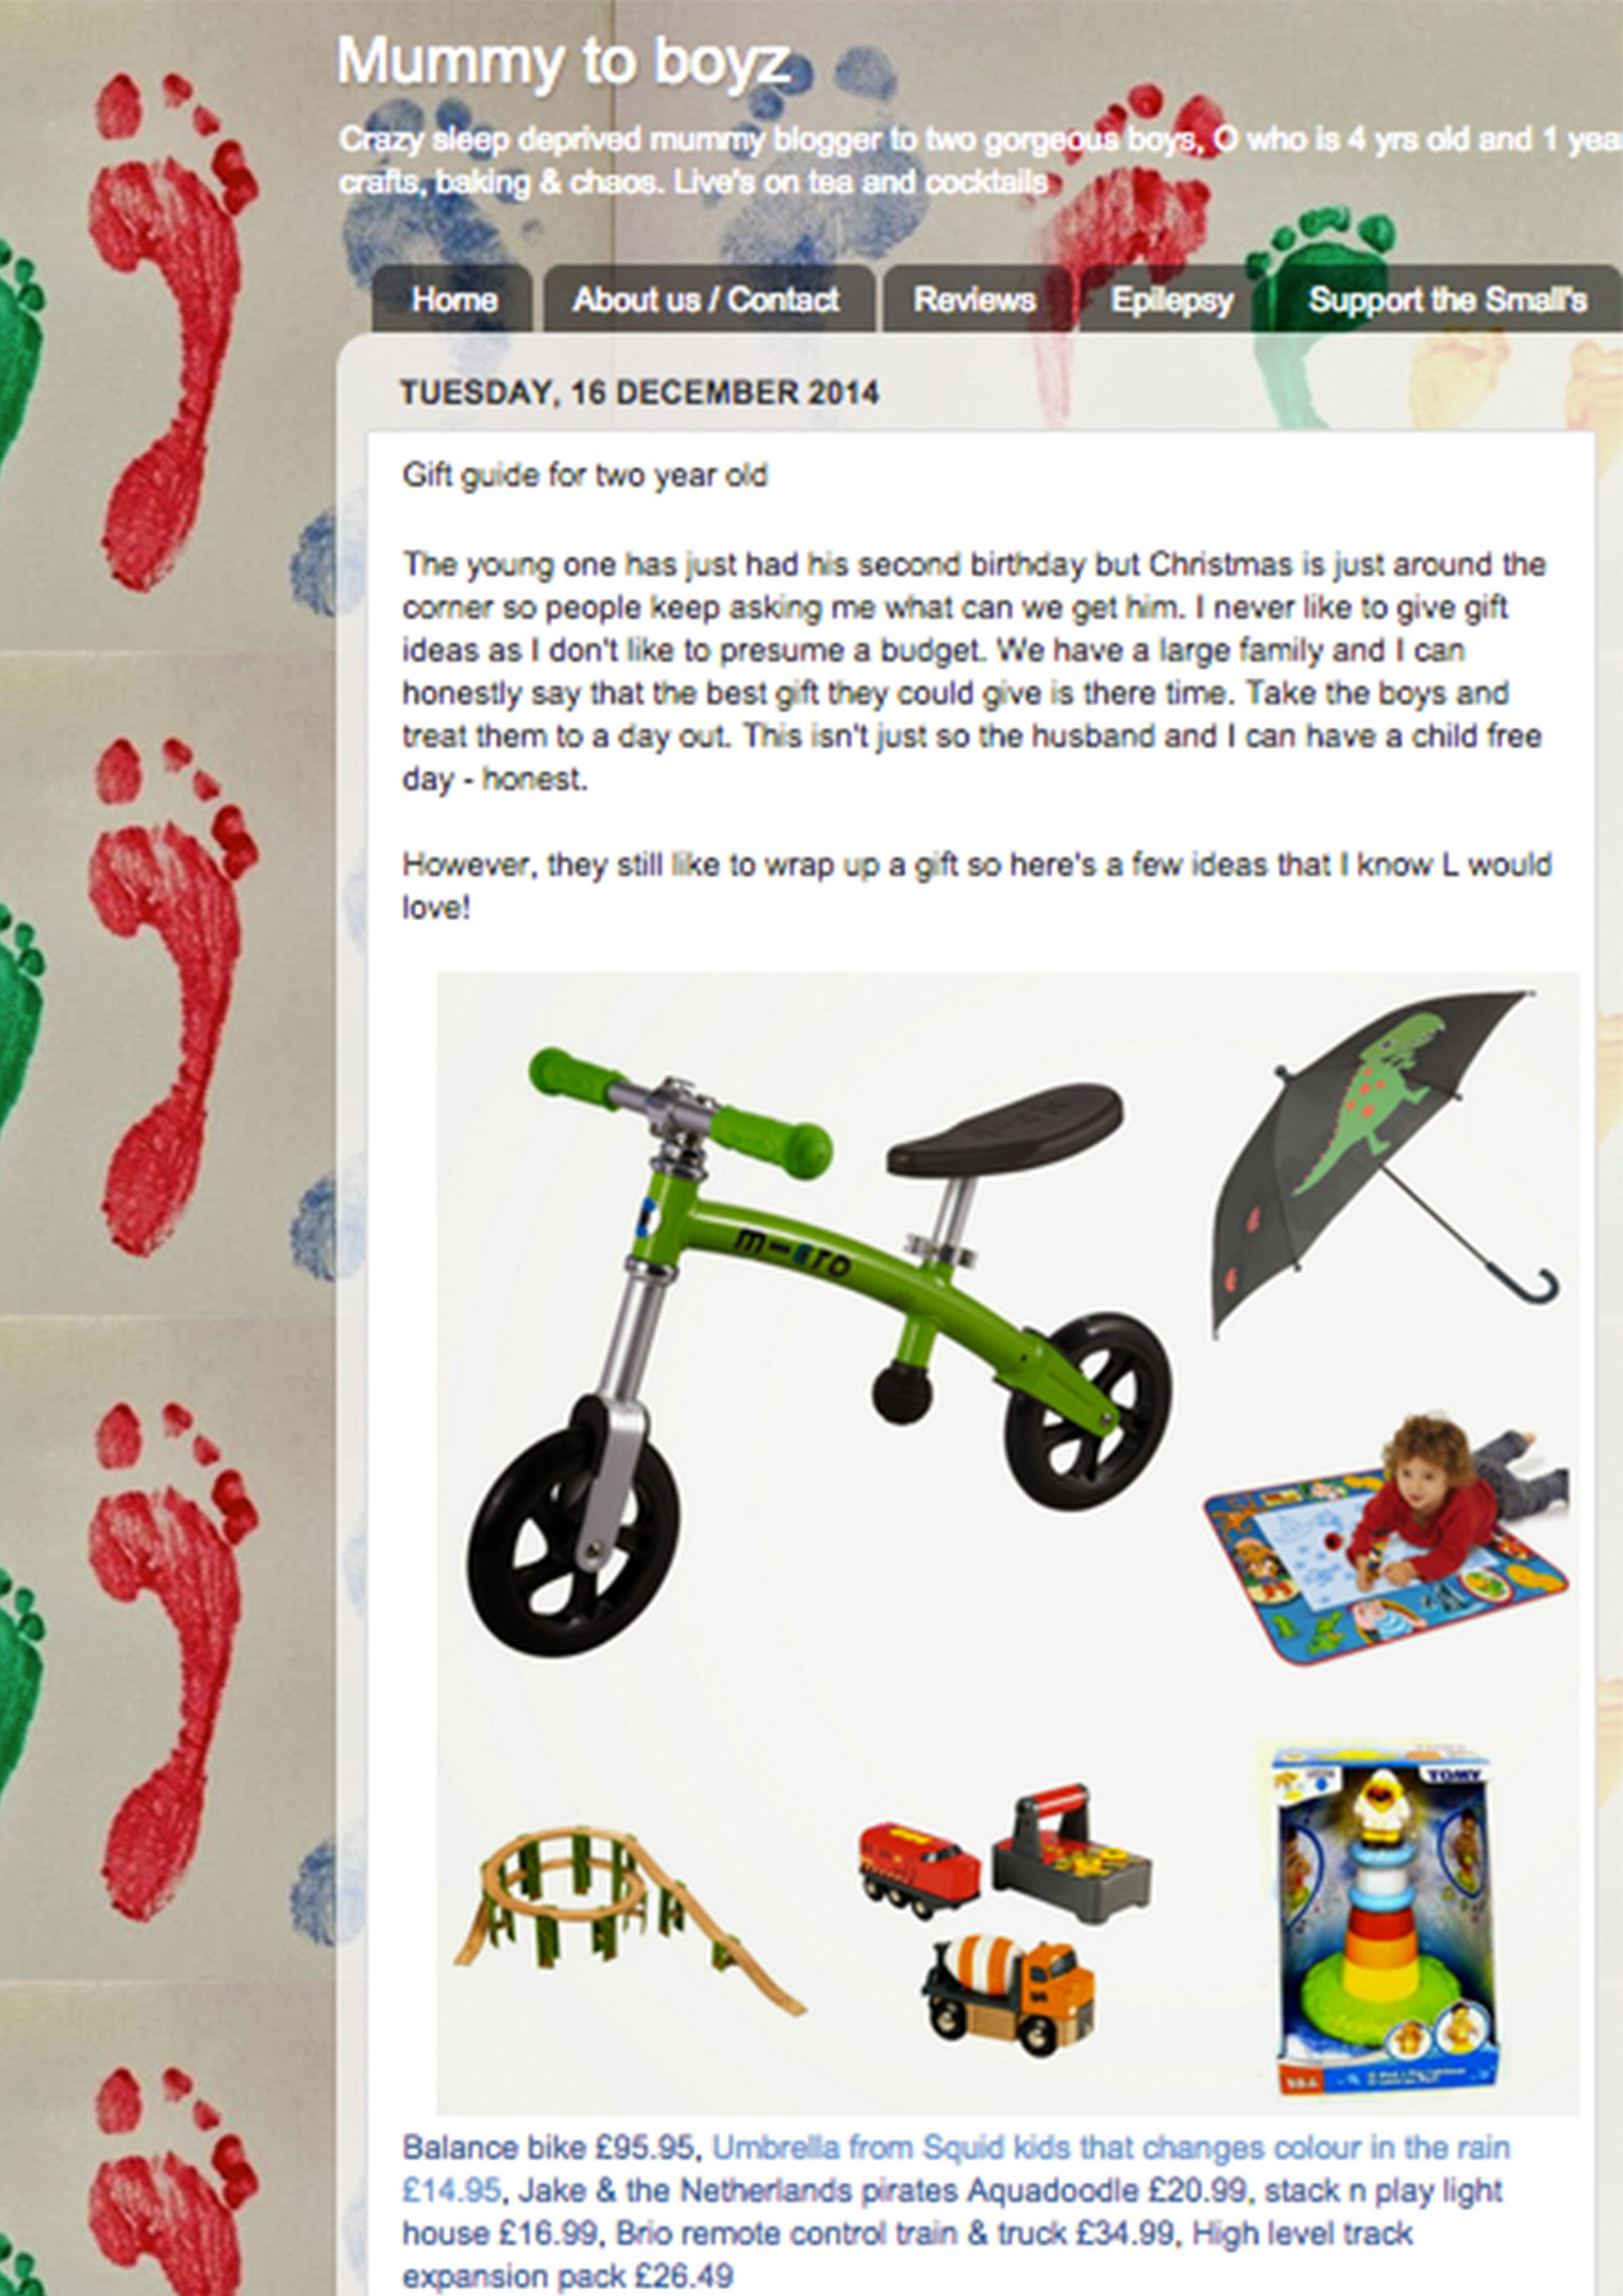 December 2014 Mummy to Boyzs